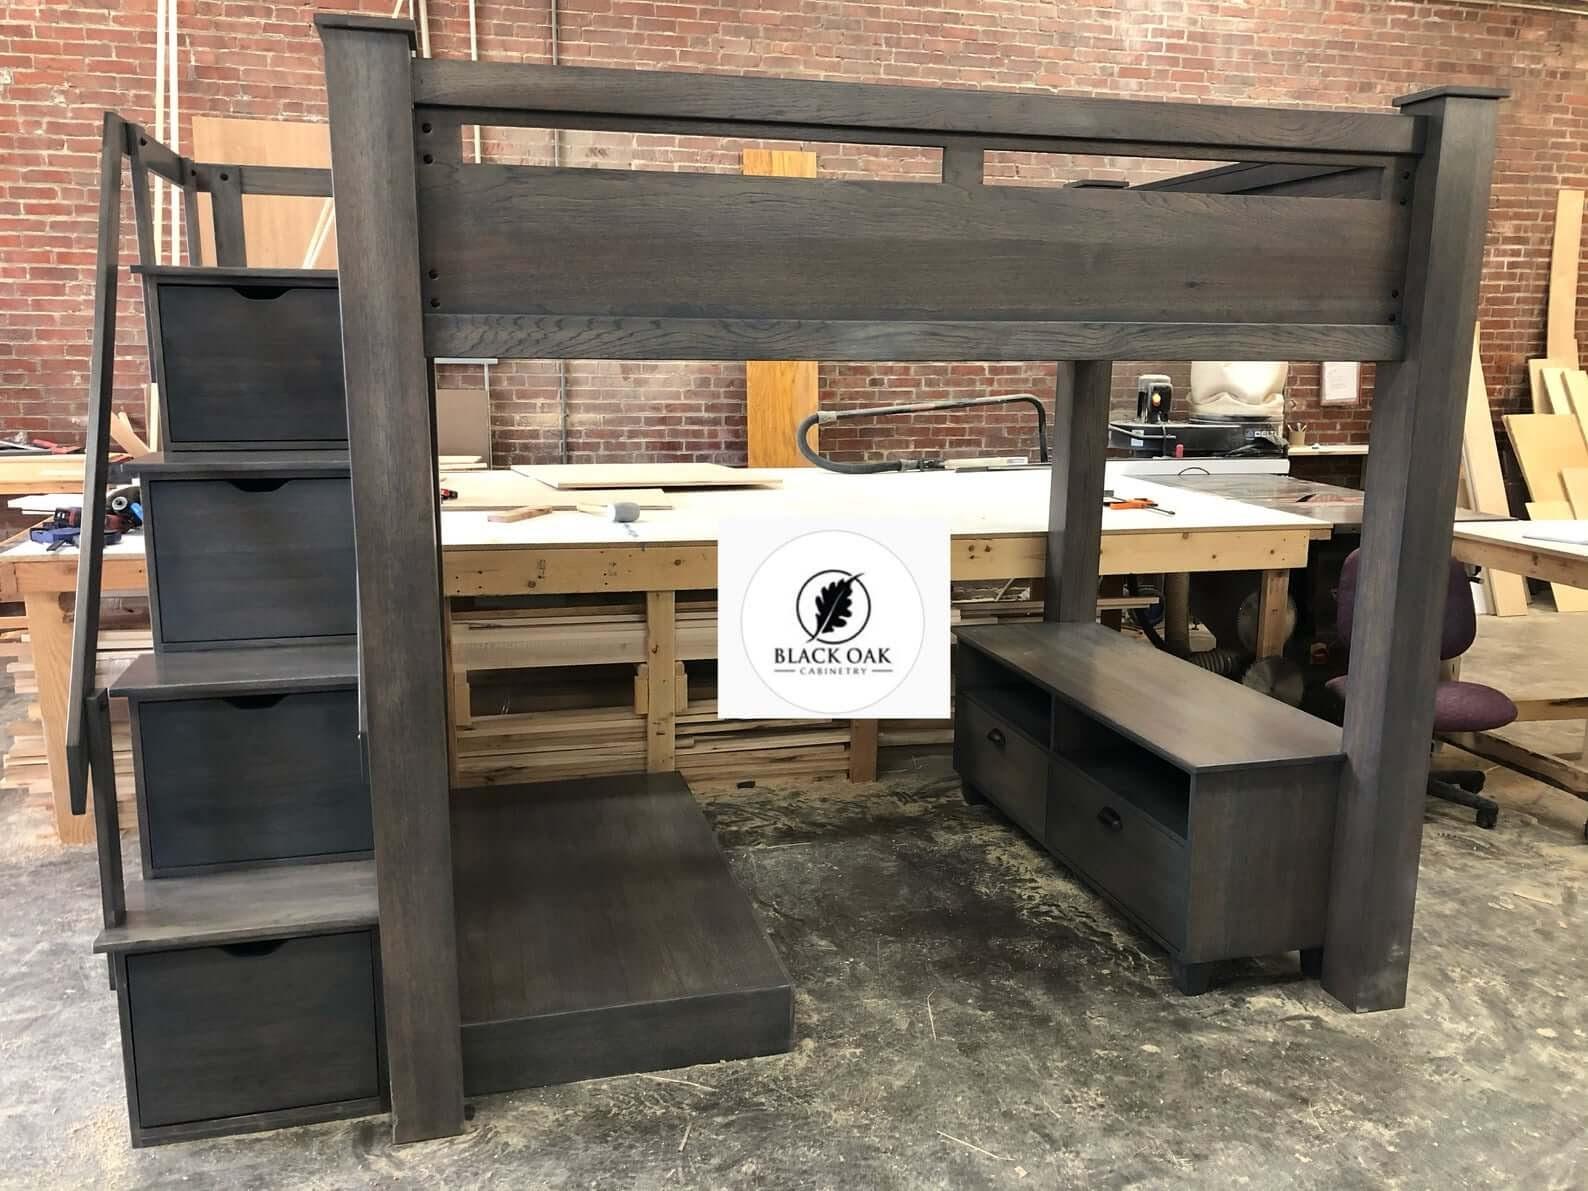 Black Oak Cabinetry Full-Size Loft Bed